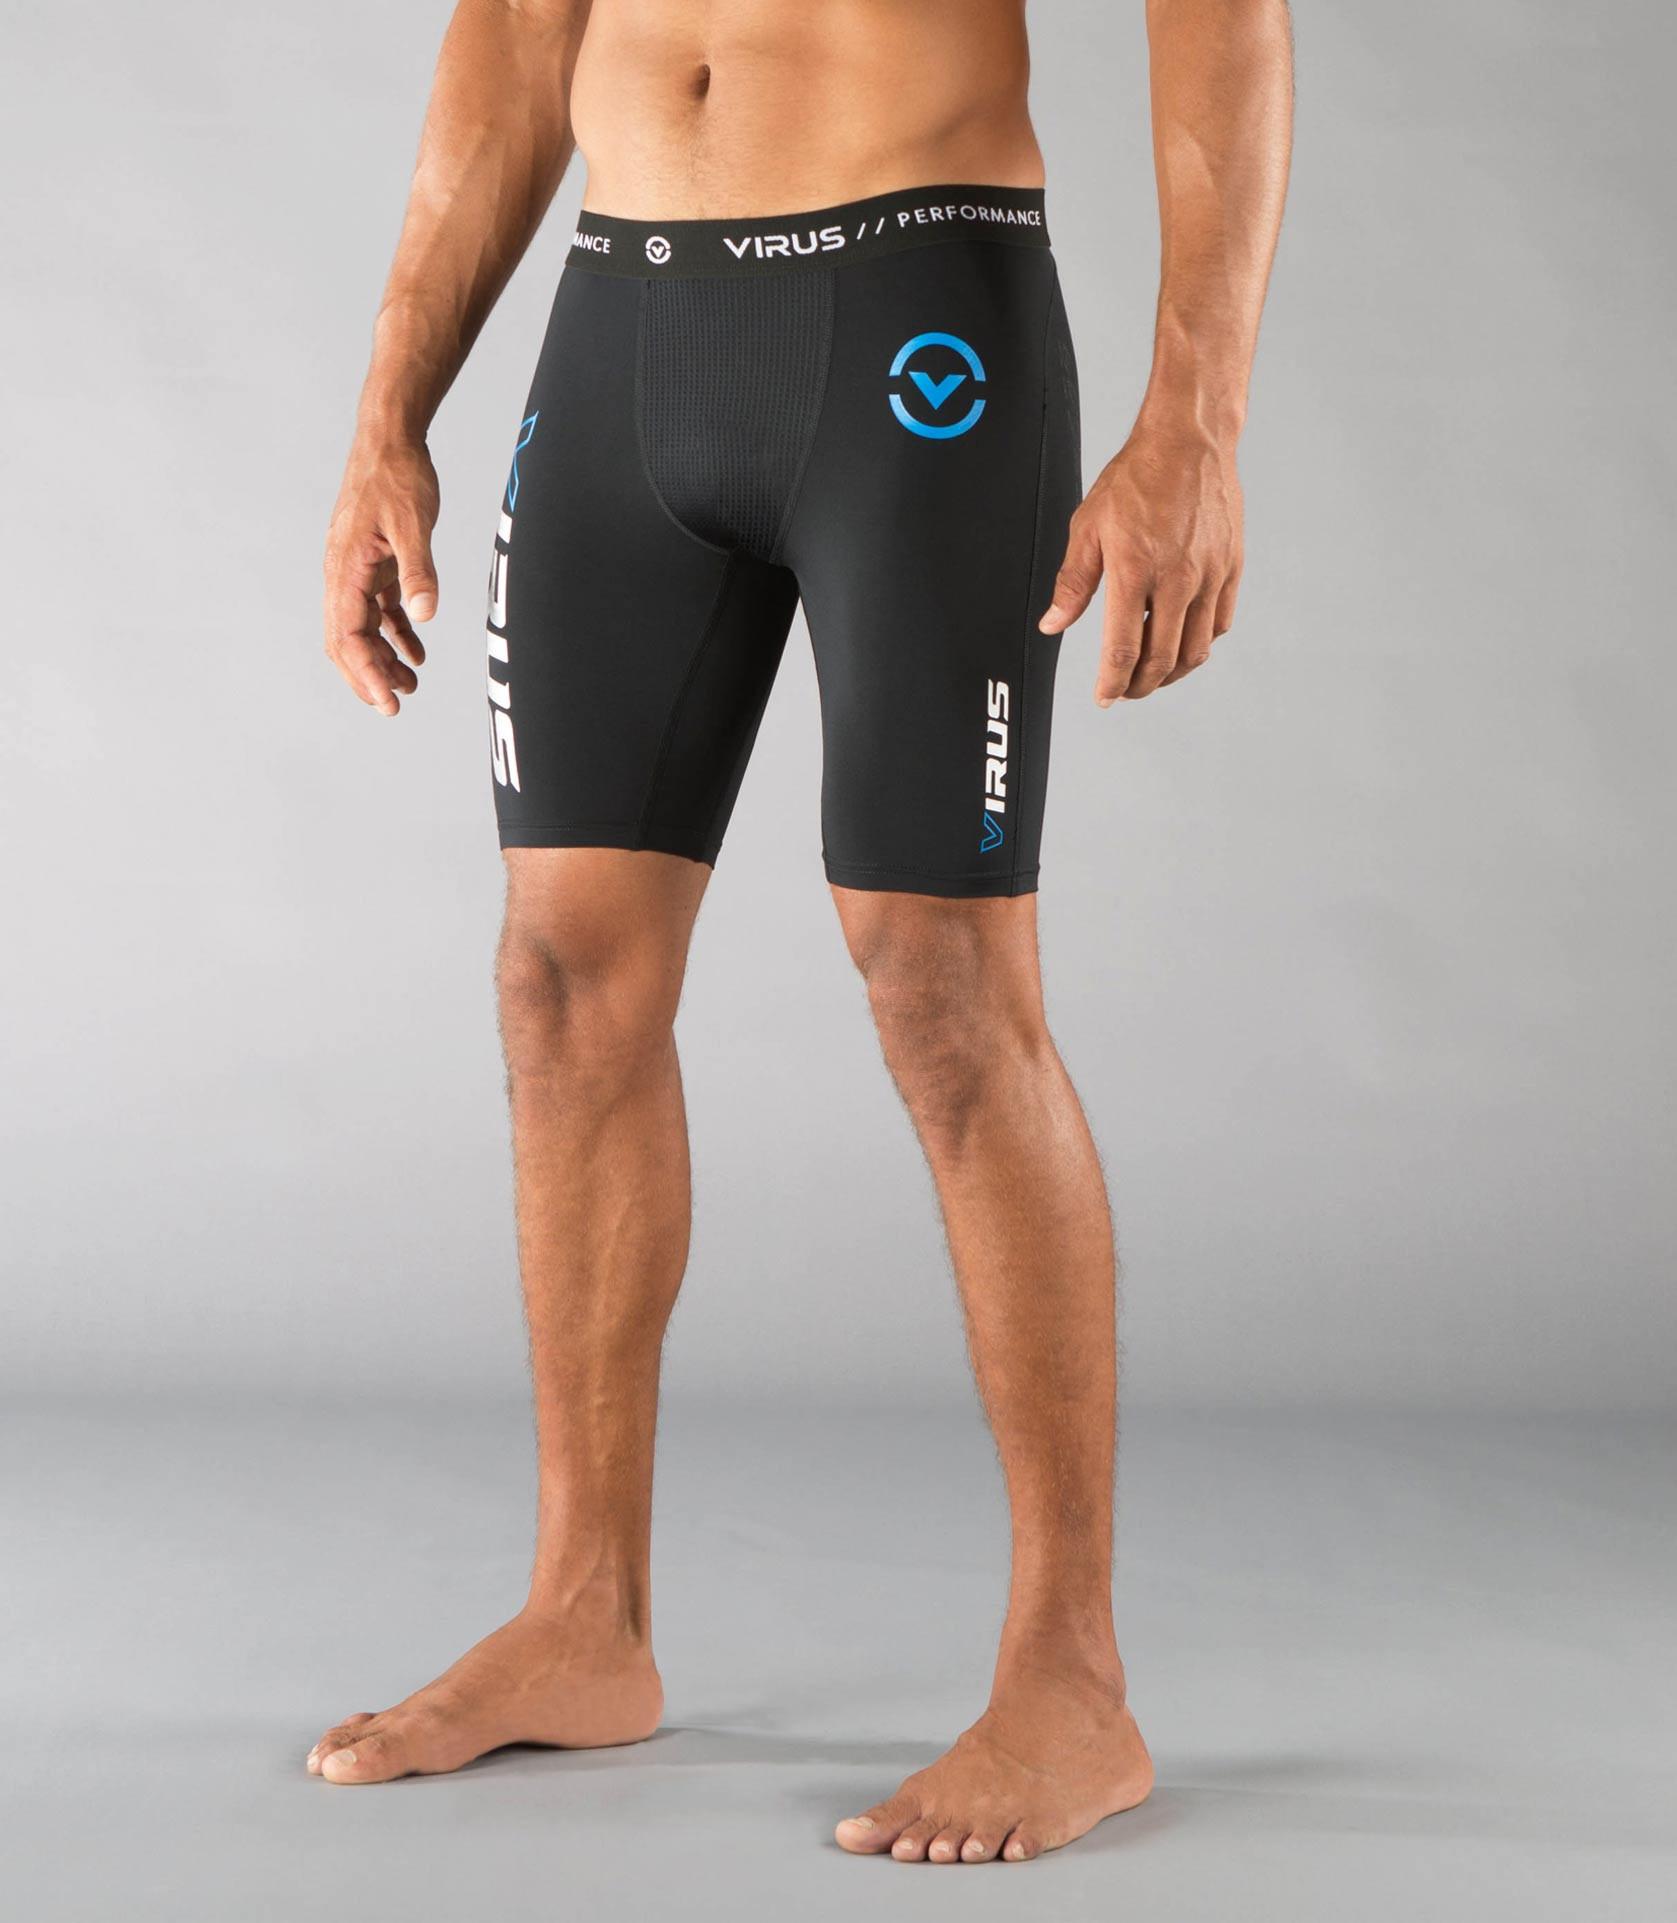 Co145男子涼爽Airflow緊身內褲